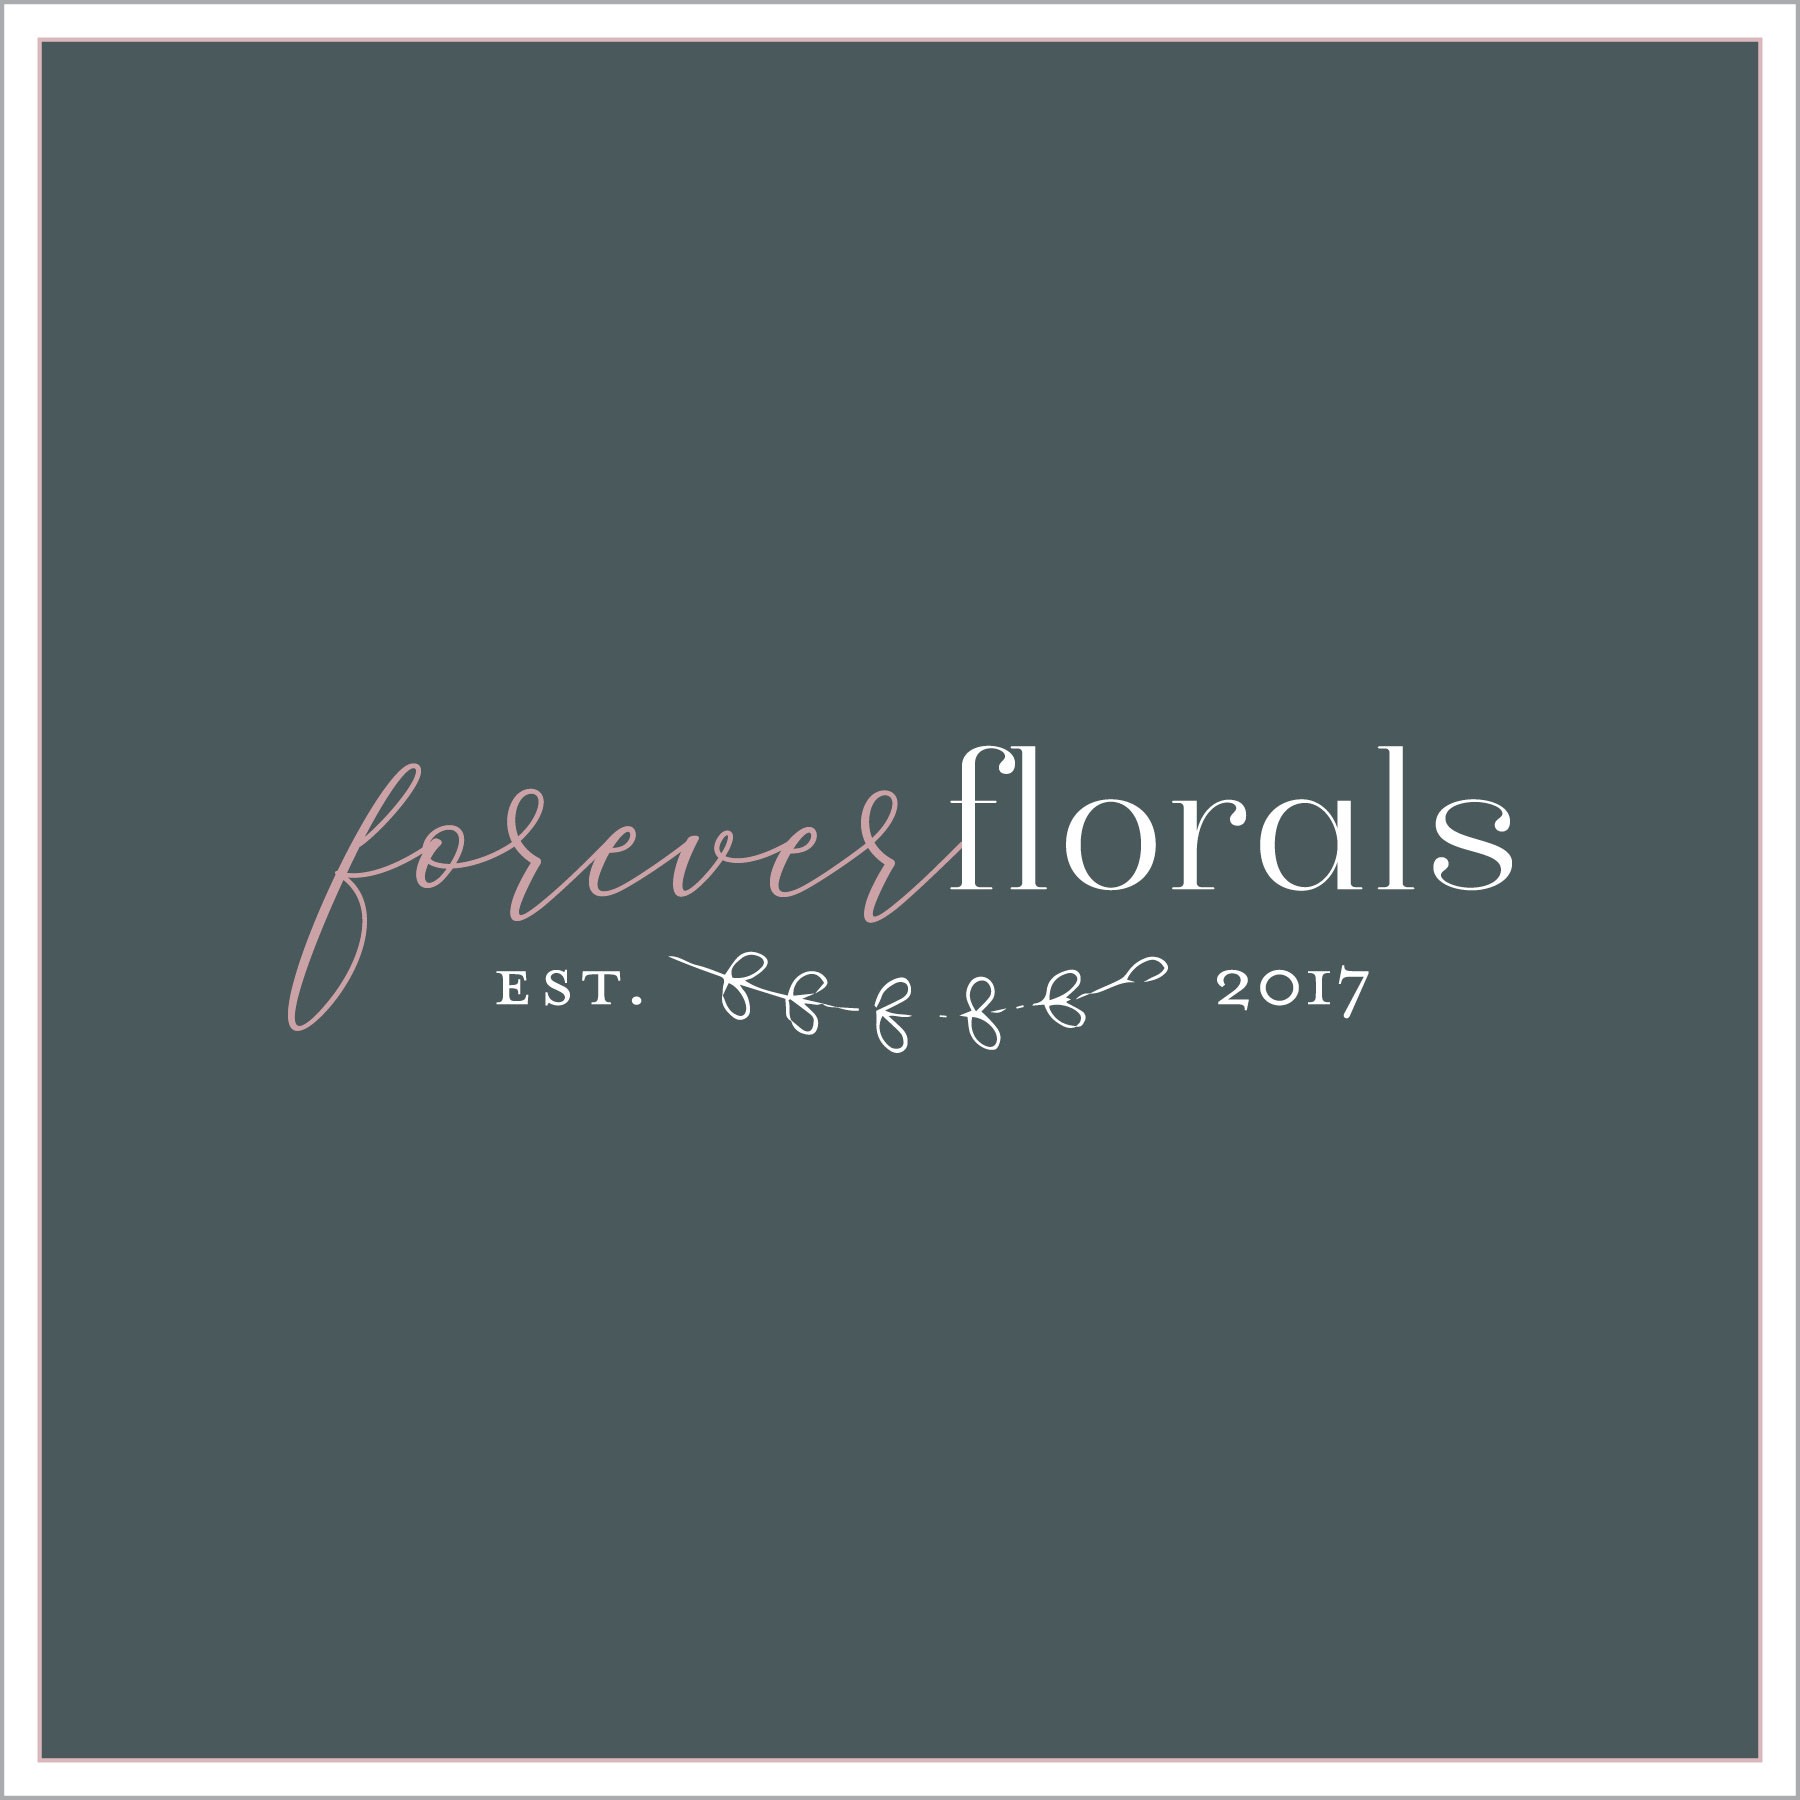 premade branding; florals; flowers; events; small business logo; graphic design; logo design; branding